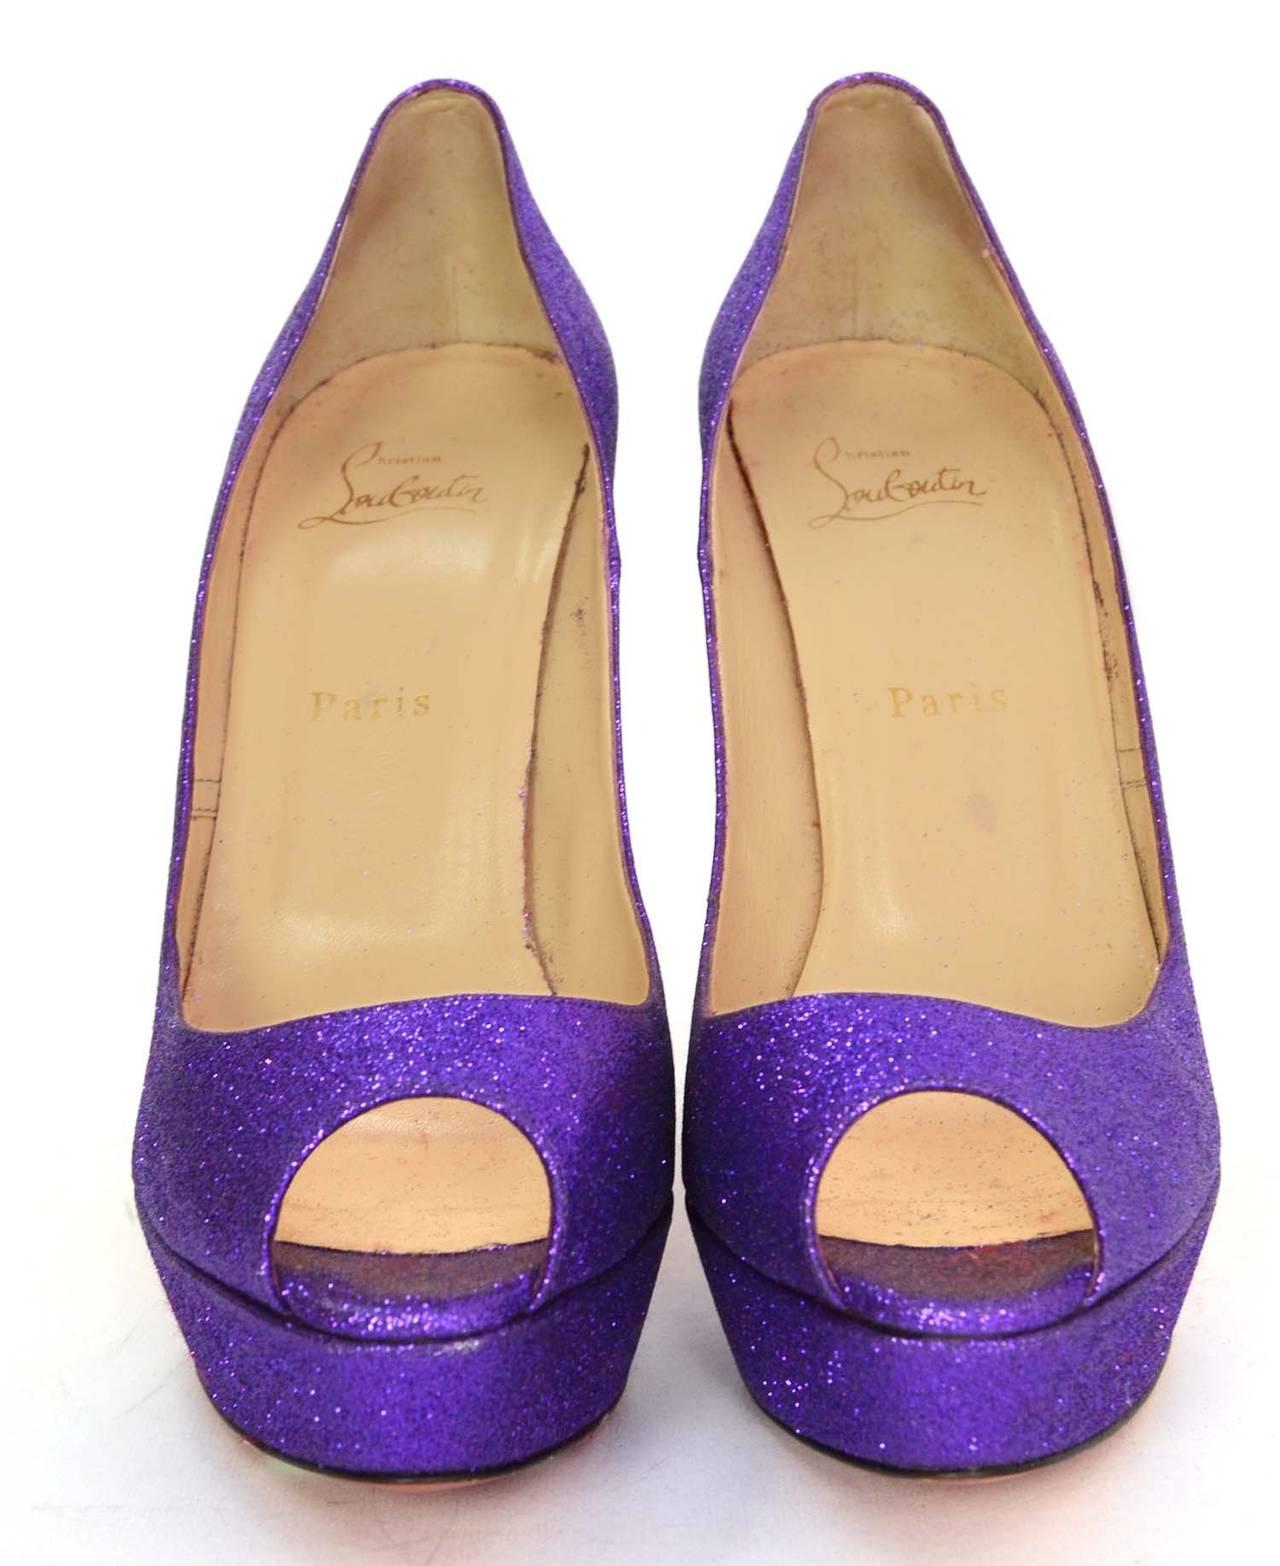 CHRISTIAN LOUBOUTIN Purple Glitter Platform Peep-Toe Pumps sz 40 2